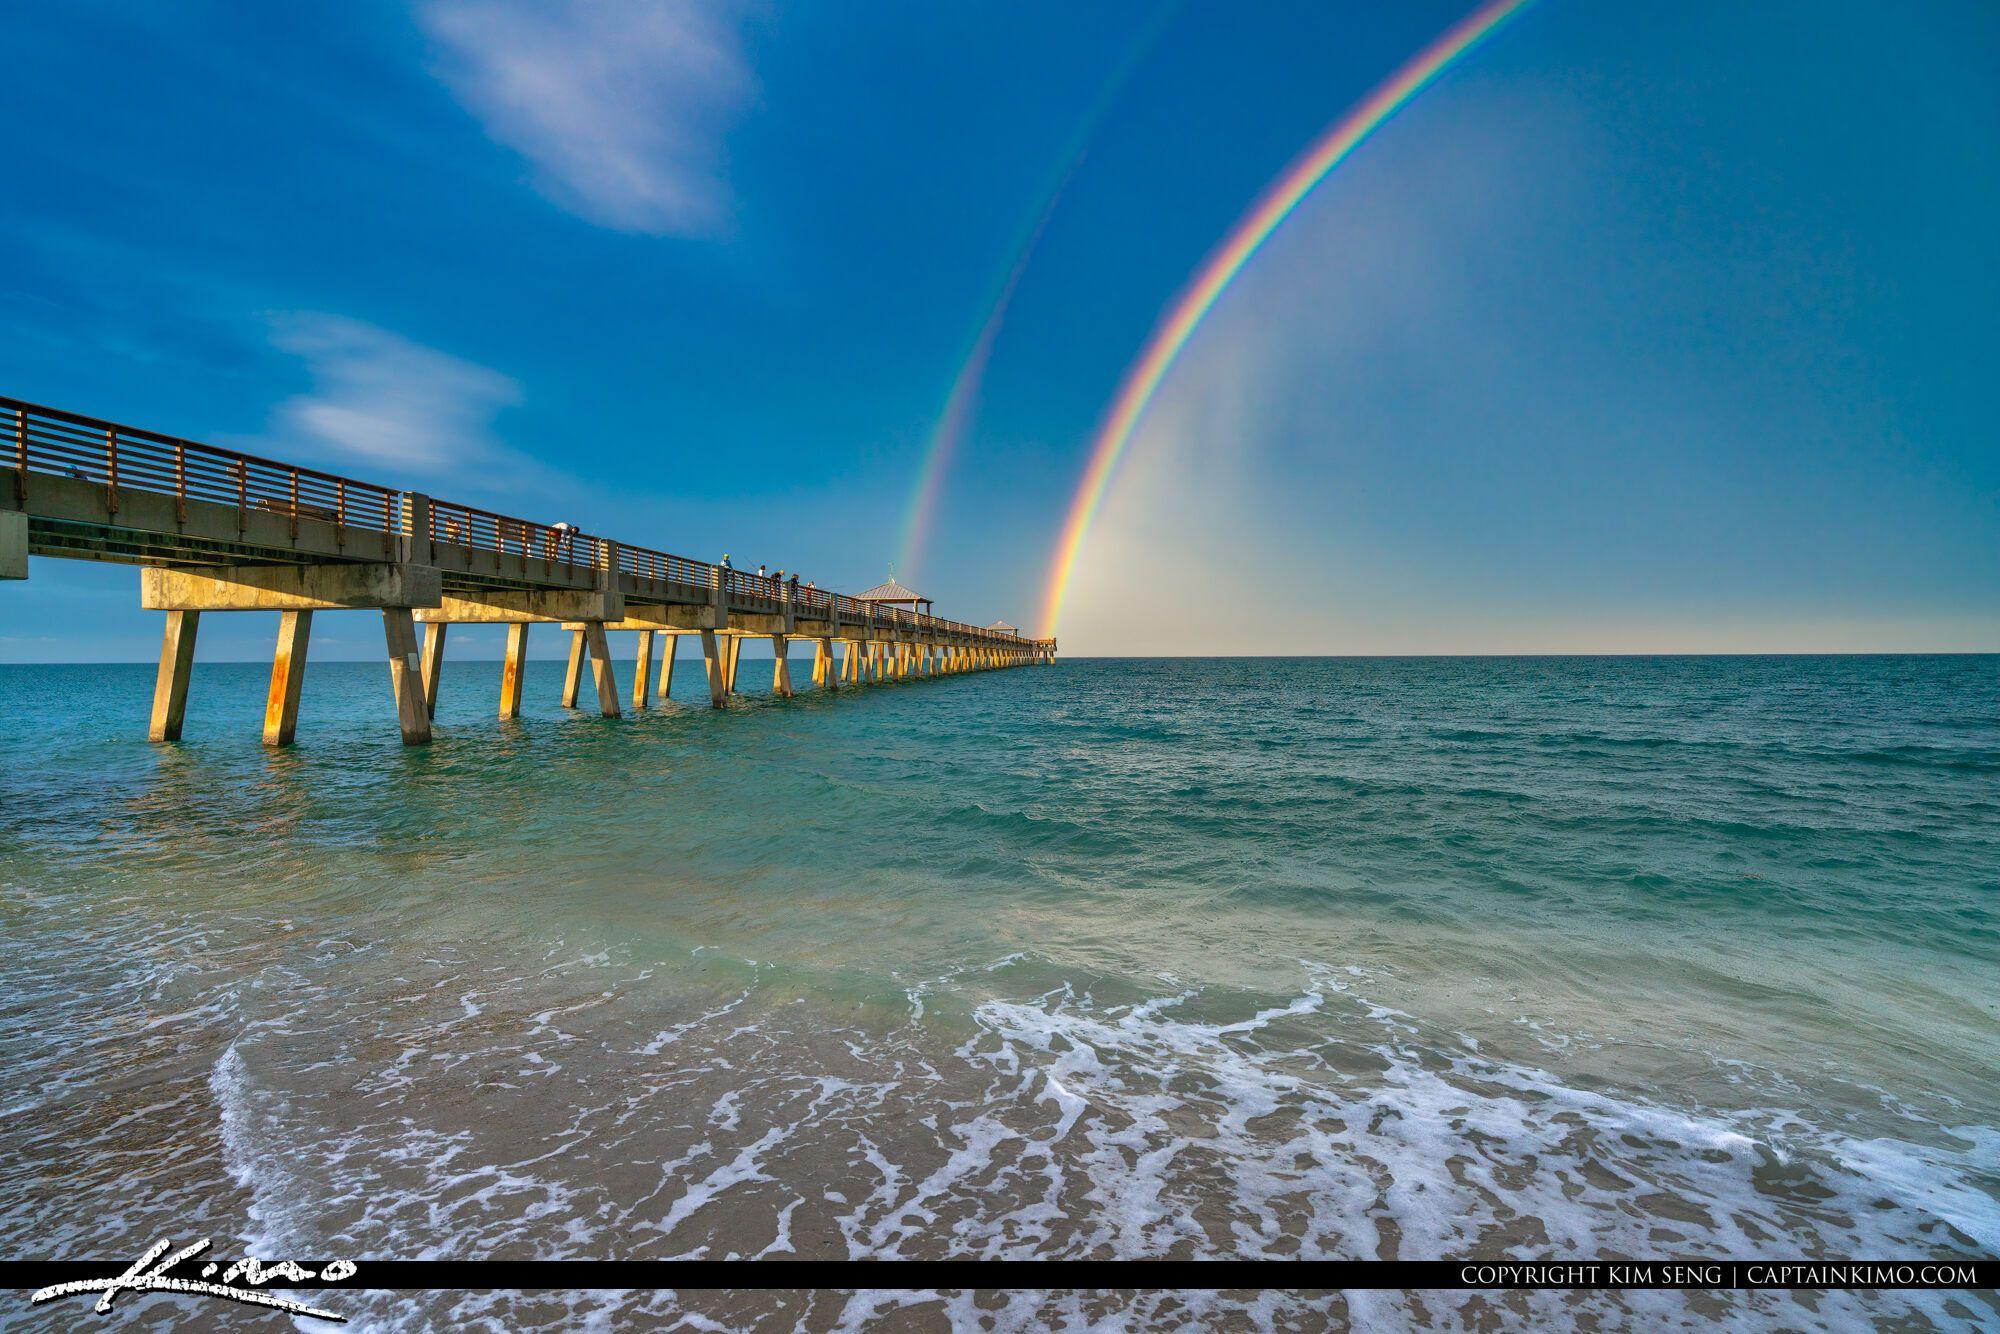 f20e2d979512c819f90727052fe5a242 - South Moon Under Palm Beach Gardens